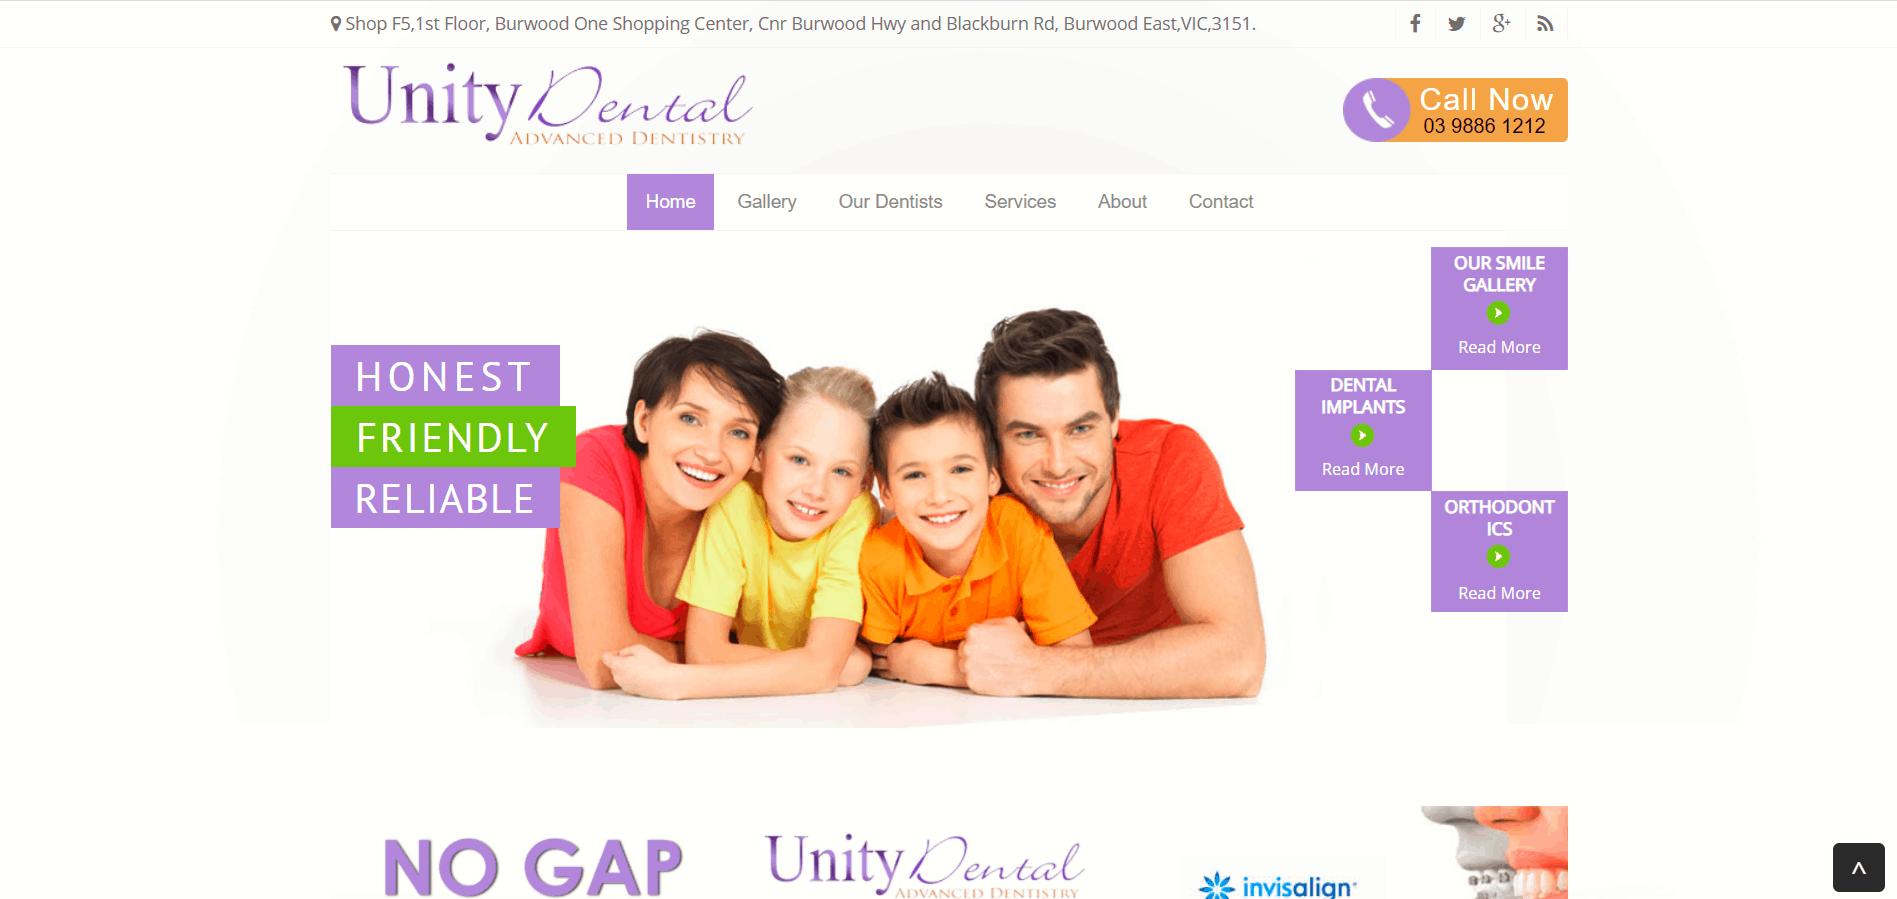 Unity Dental